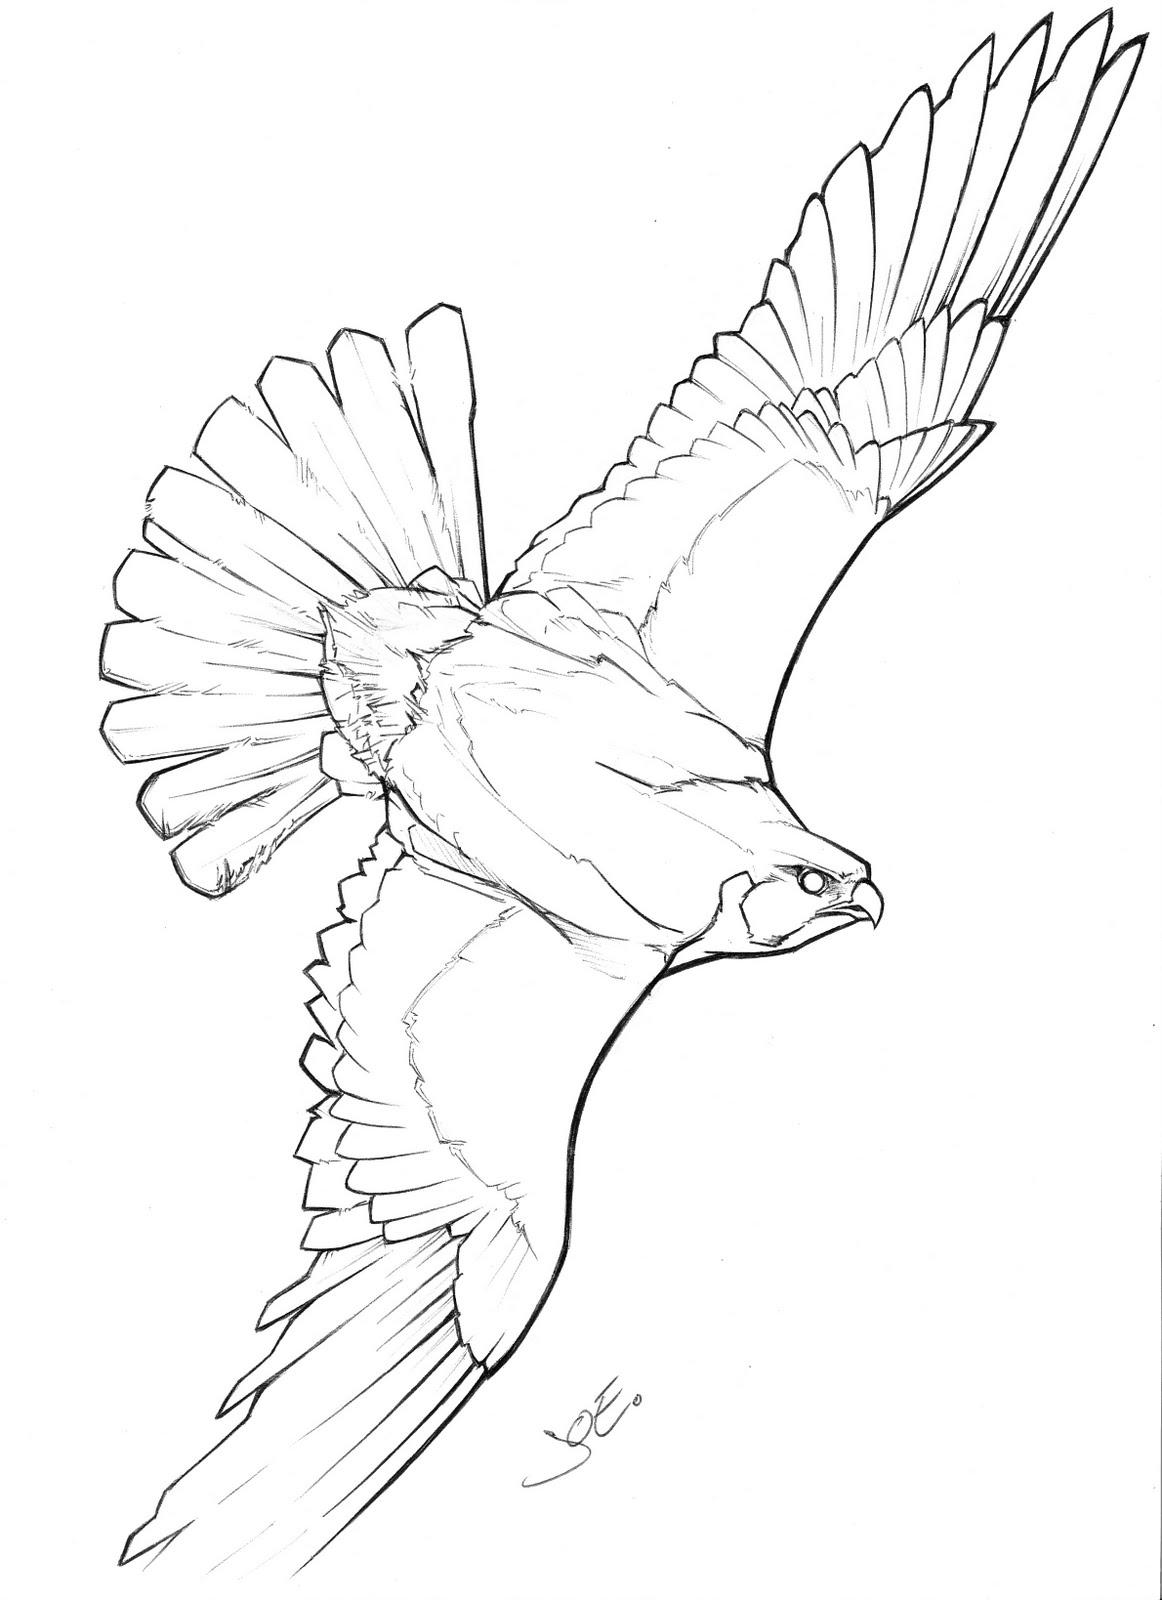 Peregrine Falcon clipart flight drawing Tatoo Interest and Interest flight